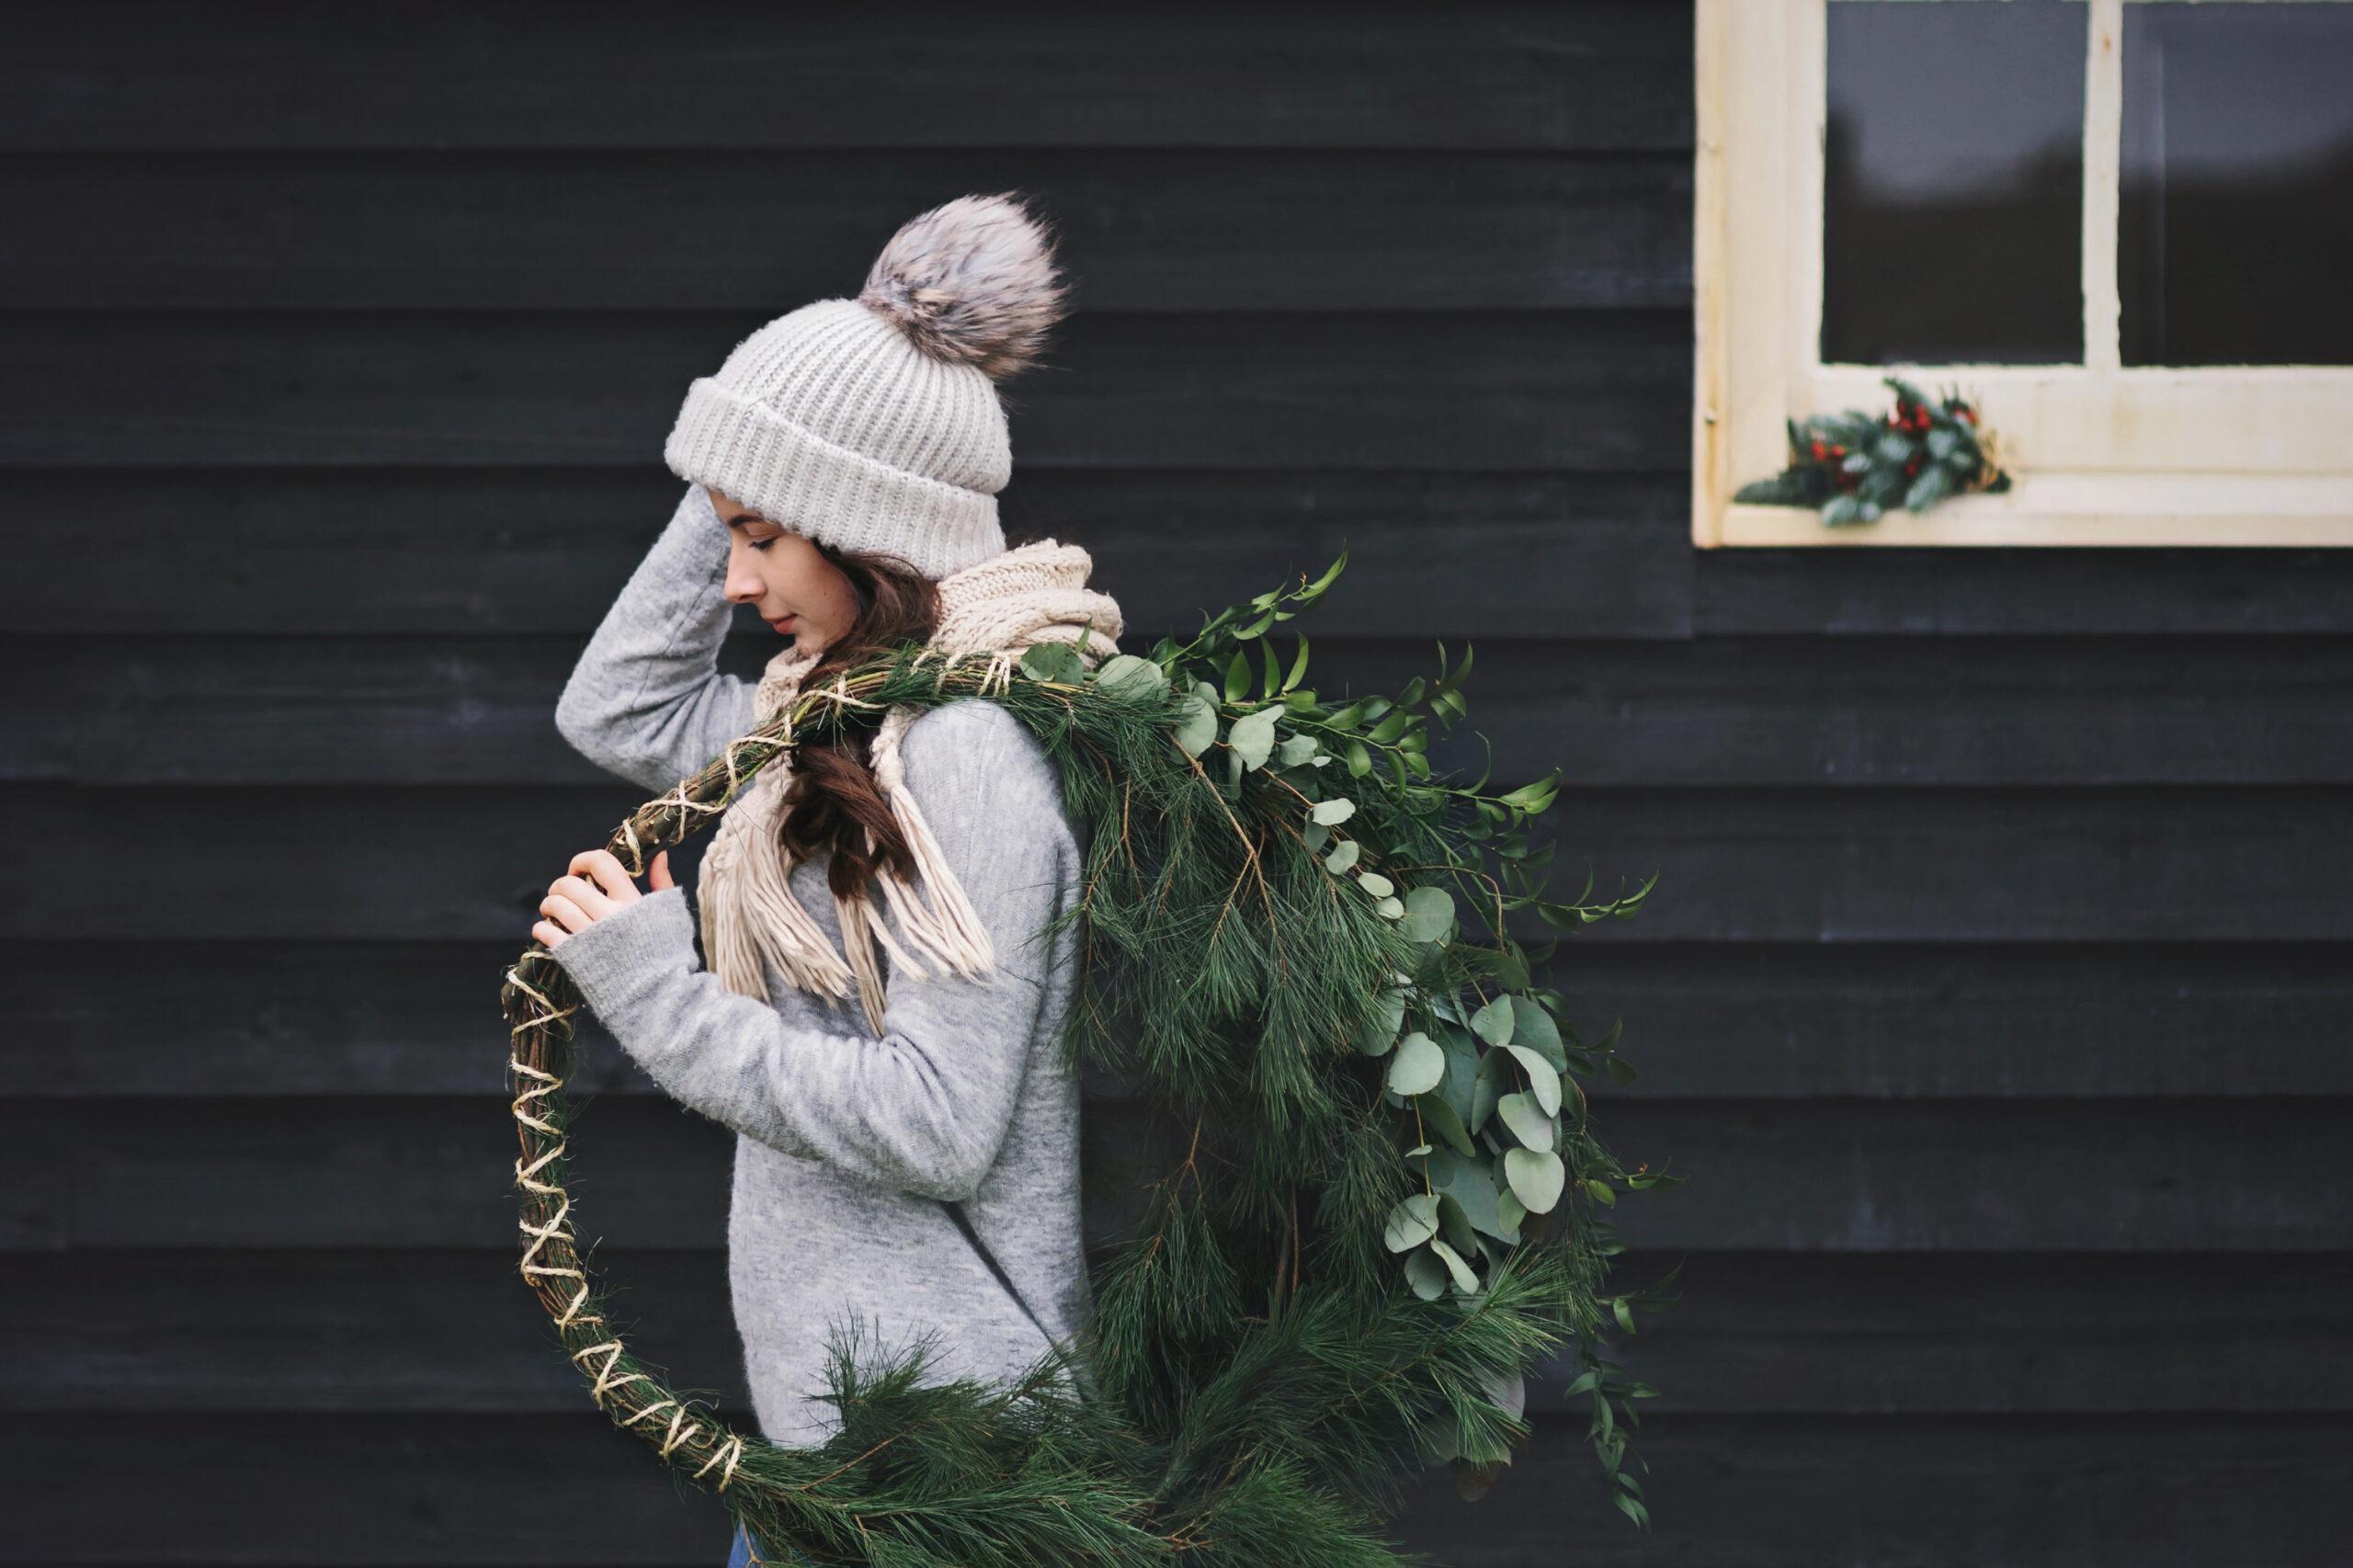 Girl with Christmas Wreath